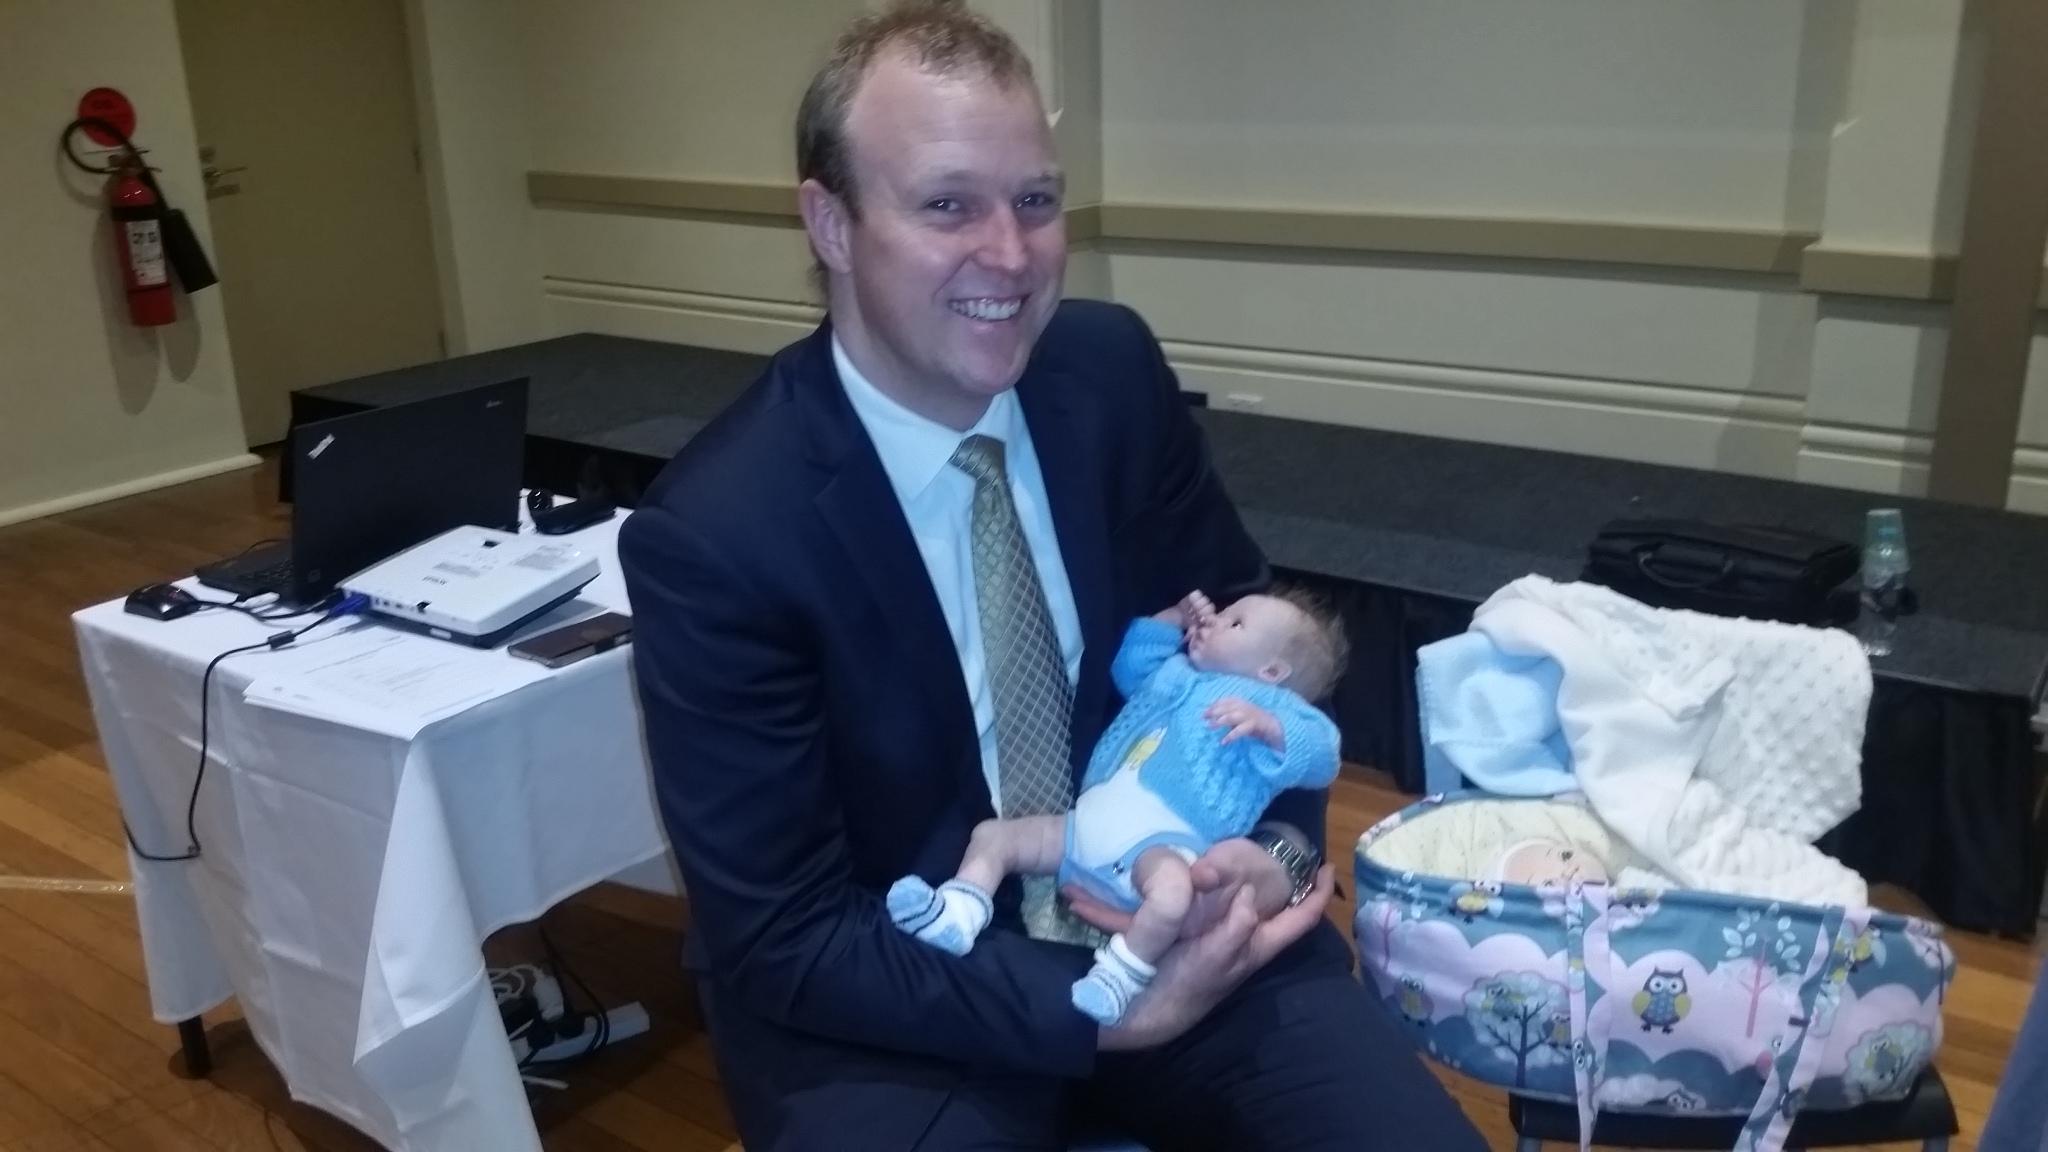 Mayor nursing reborn